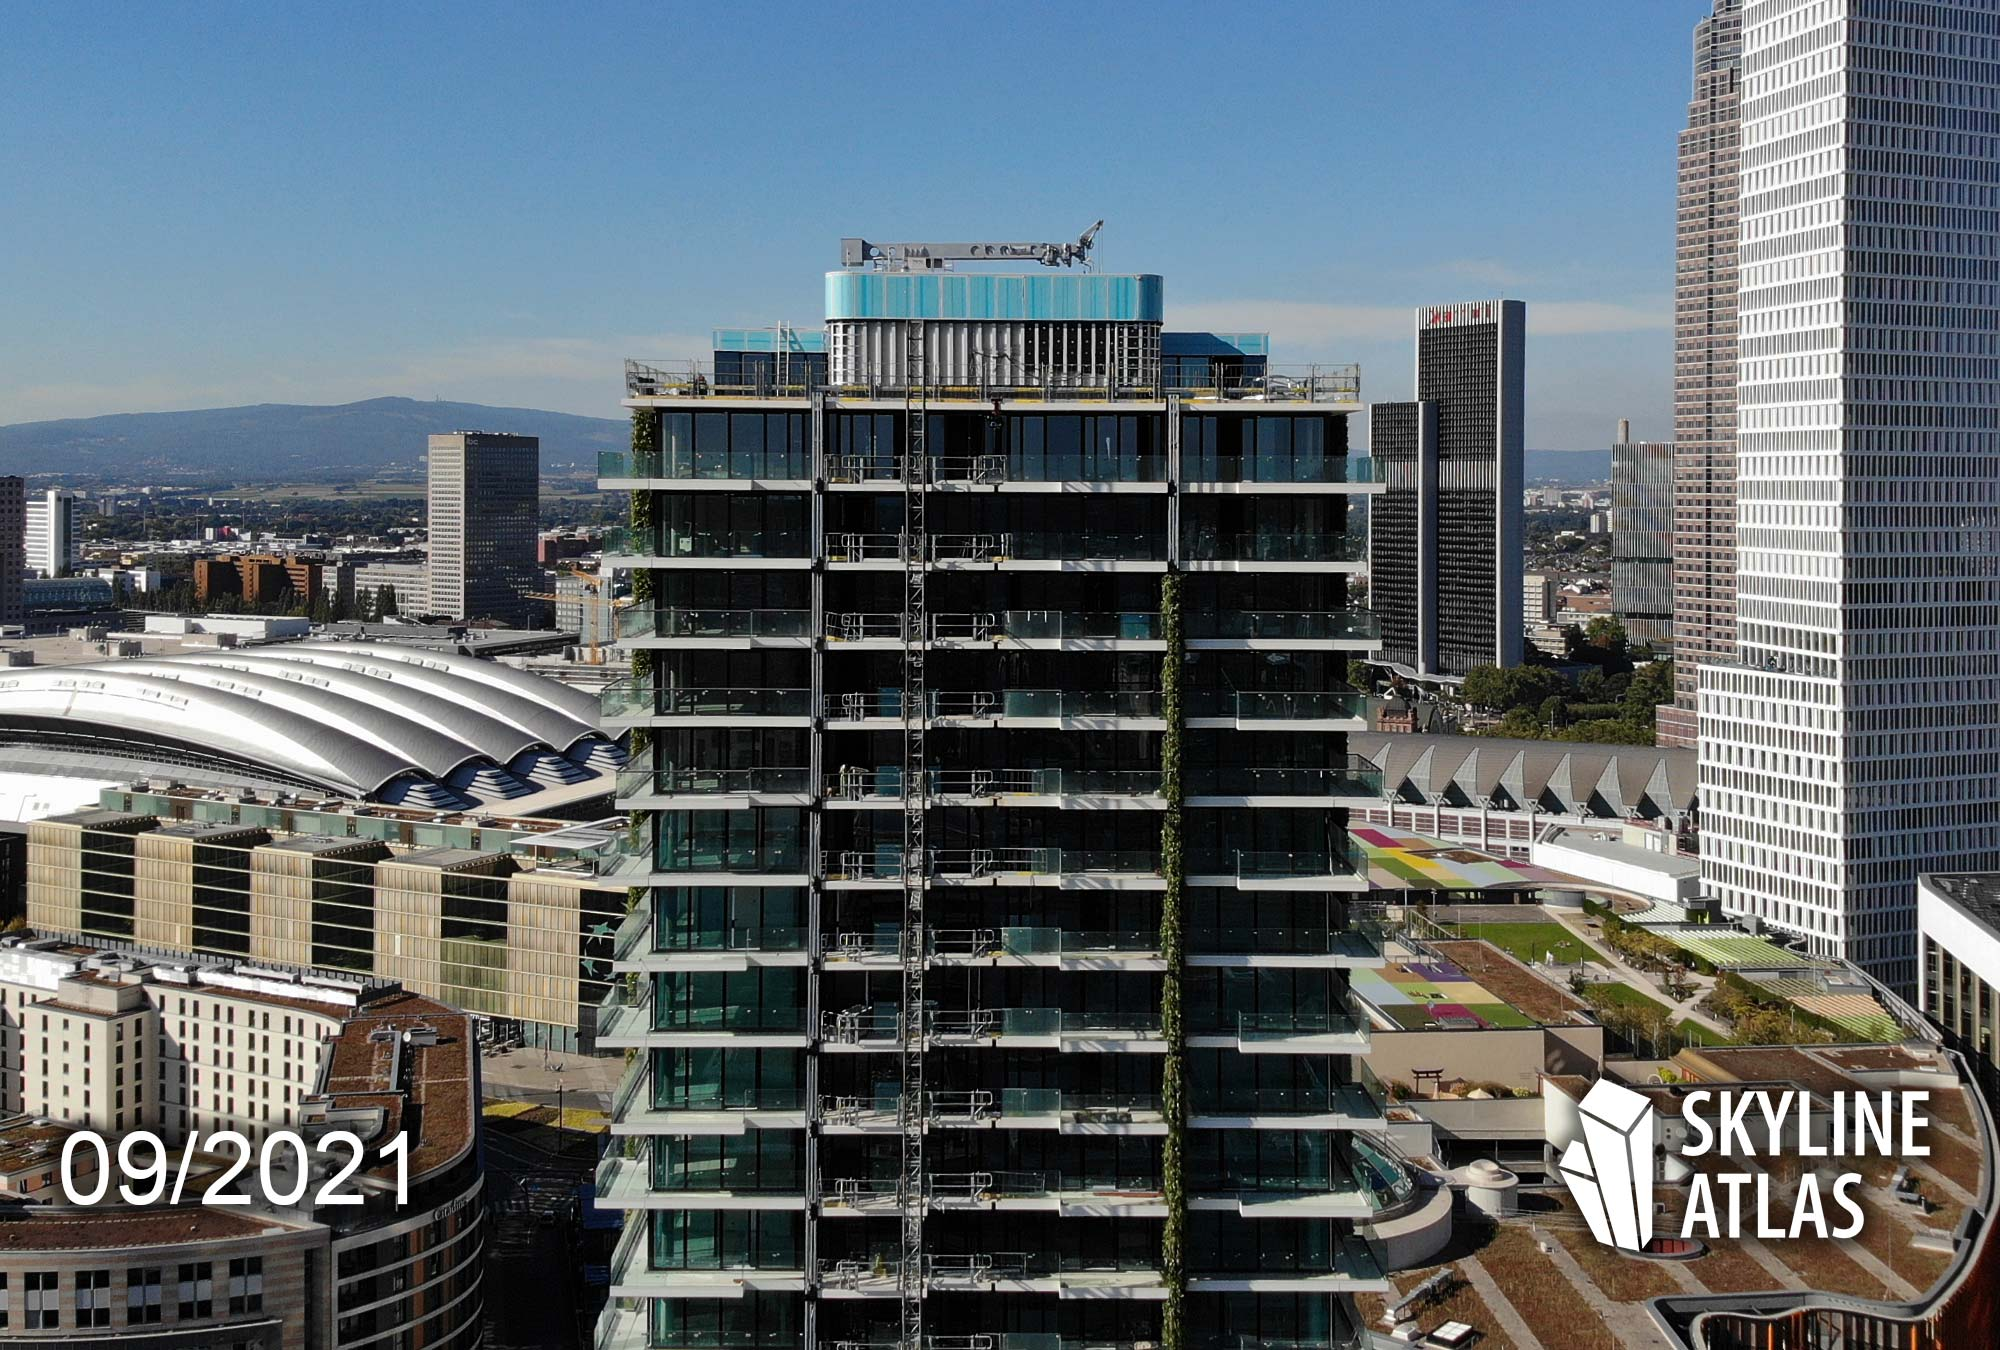 Frankfurt Eden Turm - Eden Tower Fassade - Baustelle Eden-Tower FFM - Europaviertel Wohnturm - September 2021